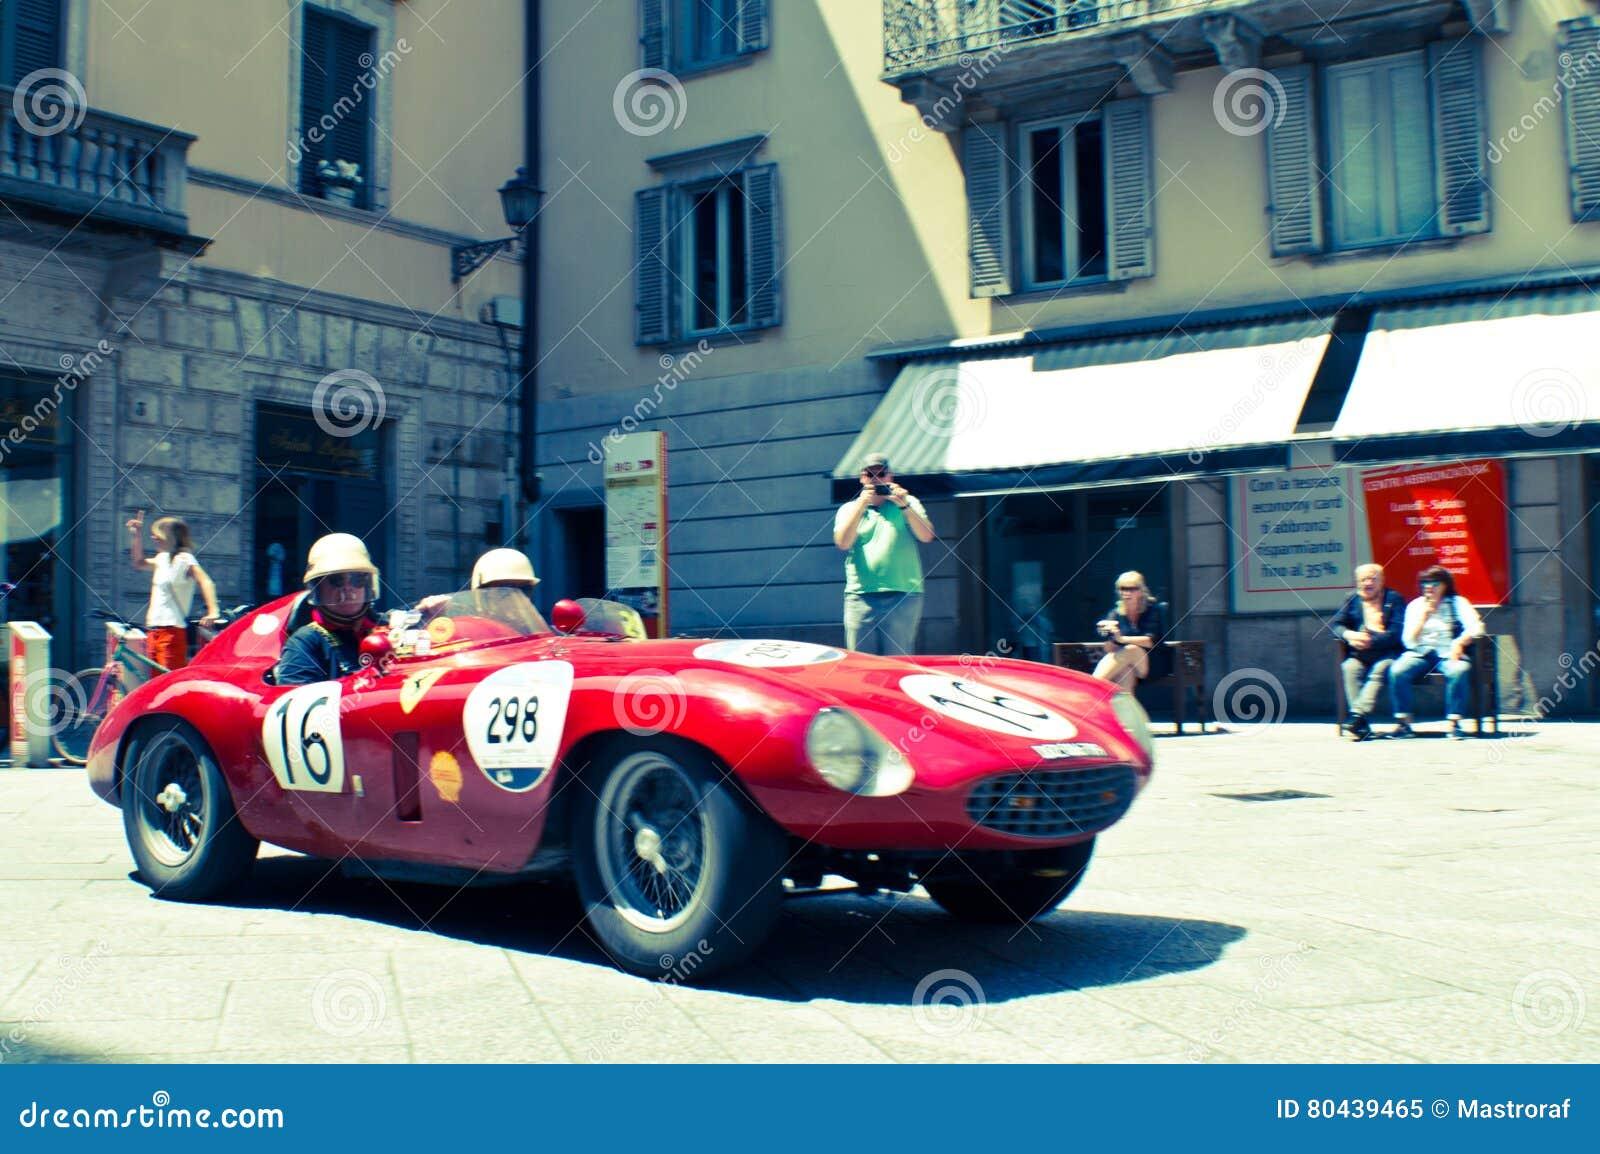 Ferrari 250 TR at Mille Miglia 2016